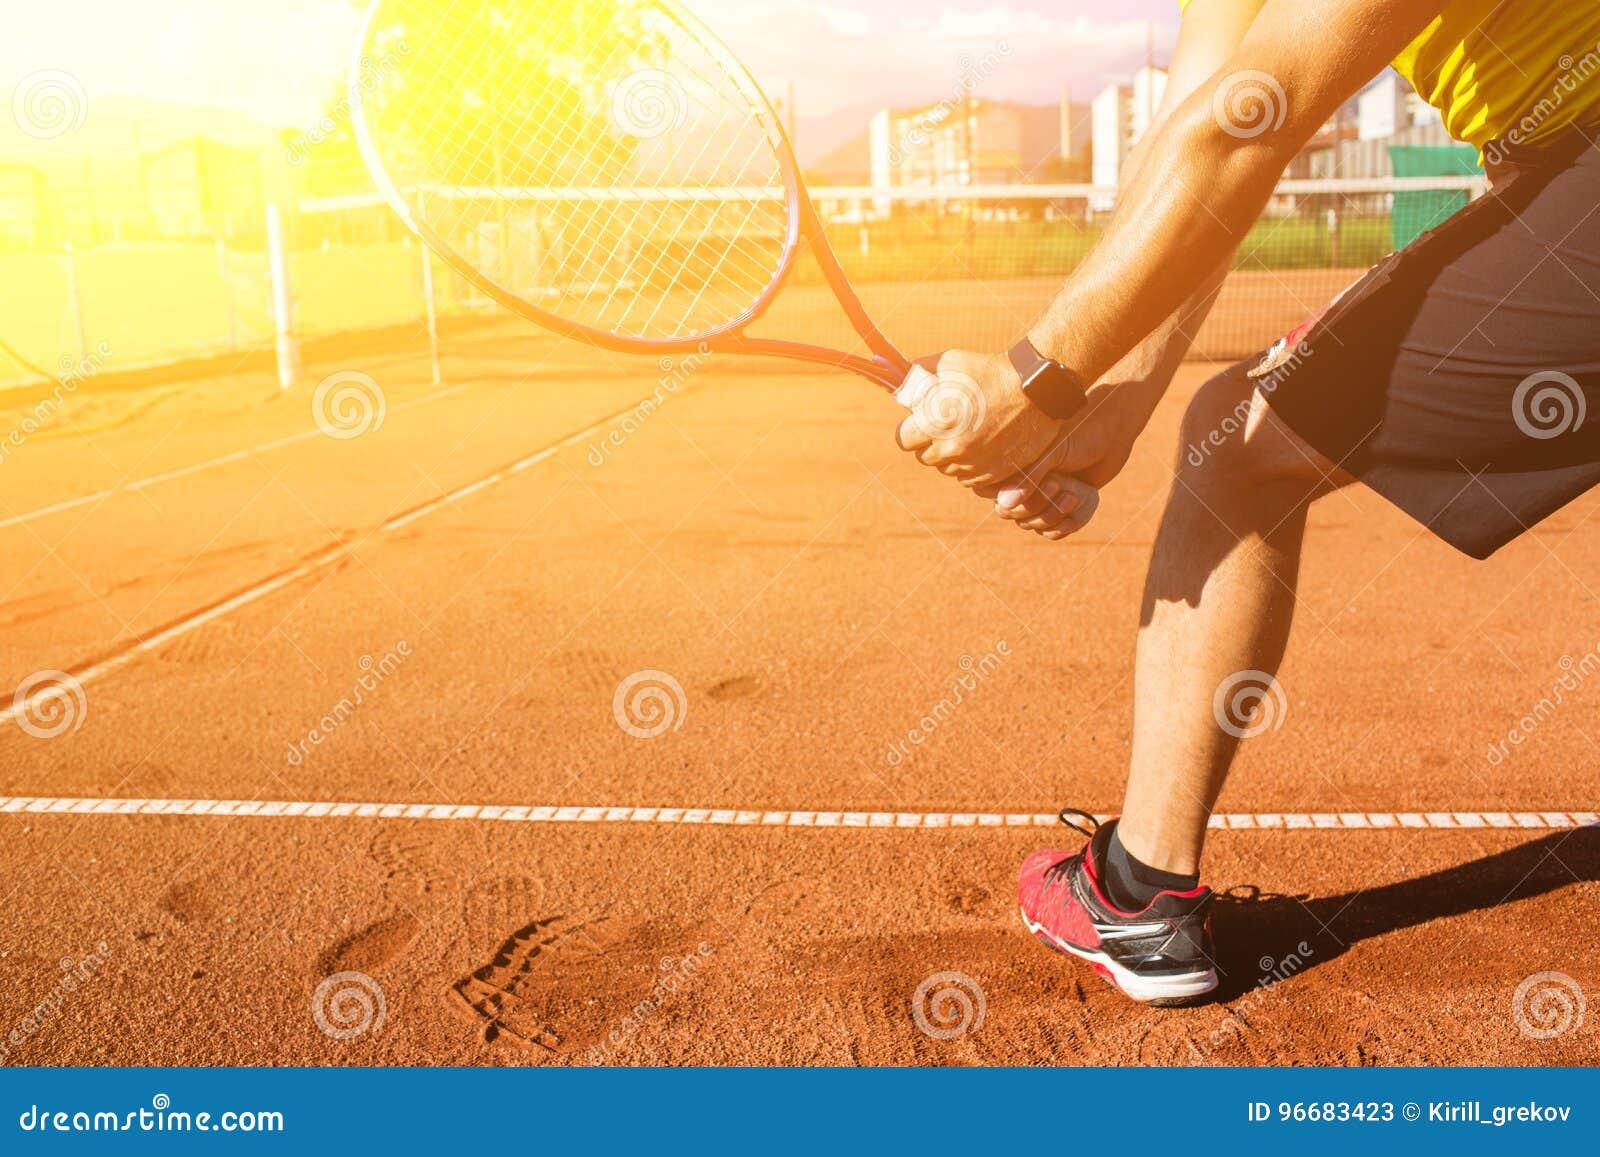 Manlig hand med tennisracket